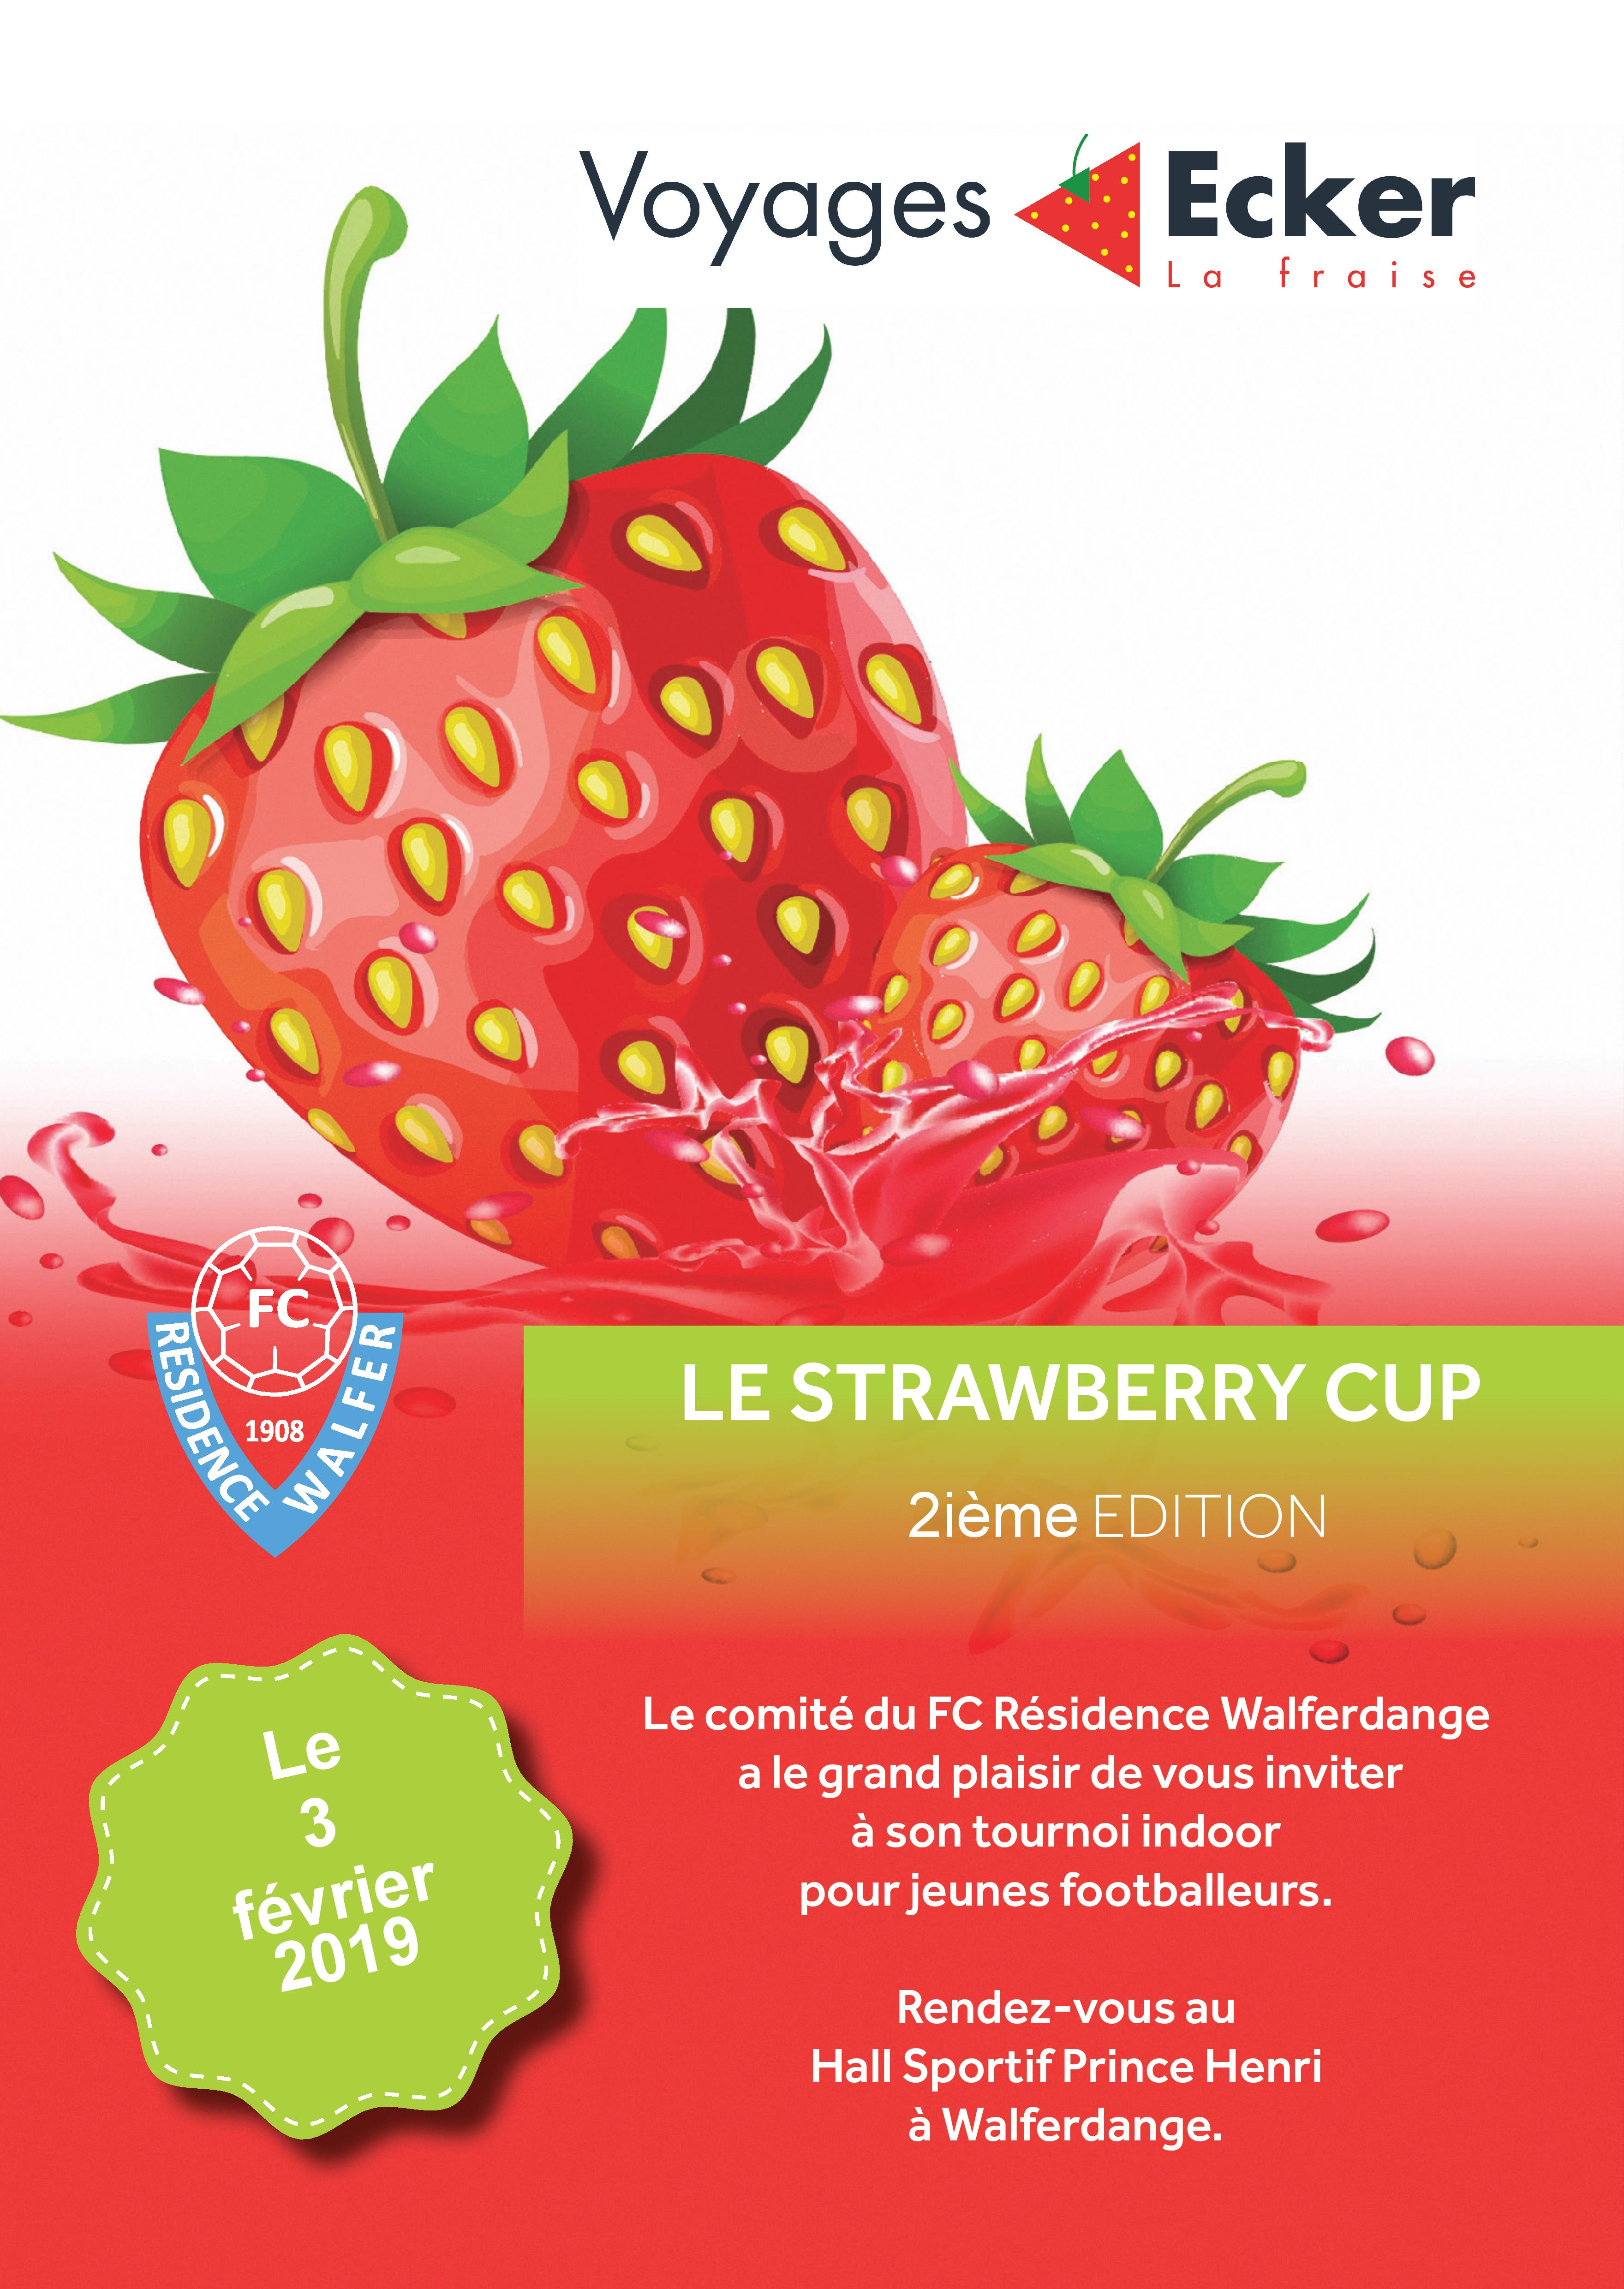 Strawberry Cup 2018 Voyage Ecker